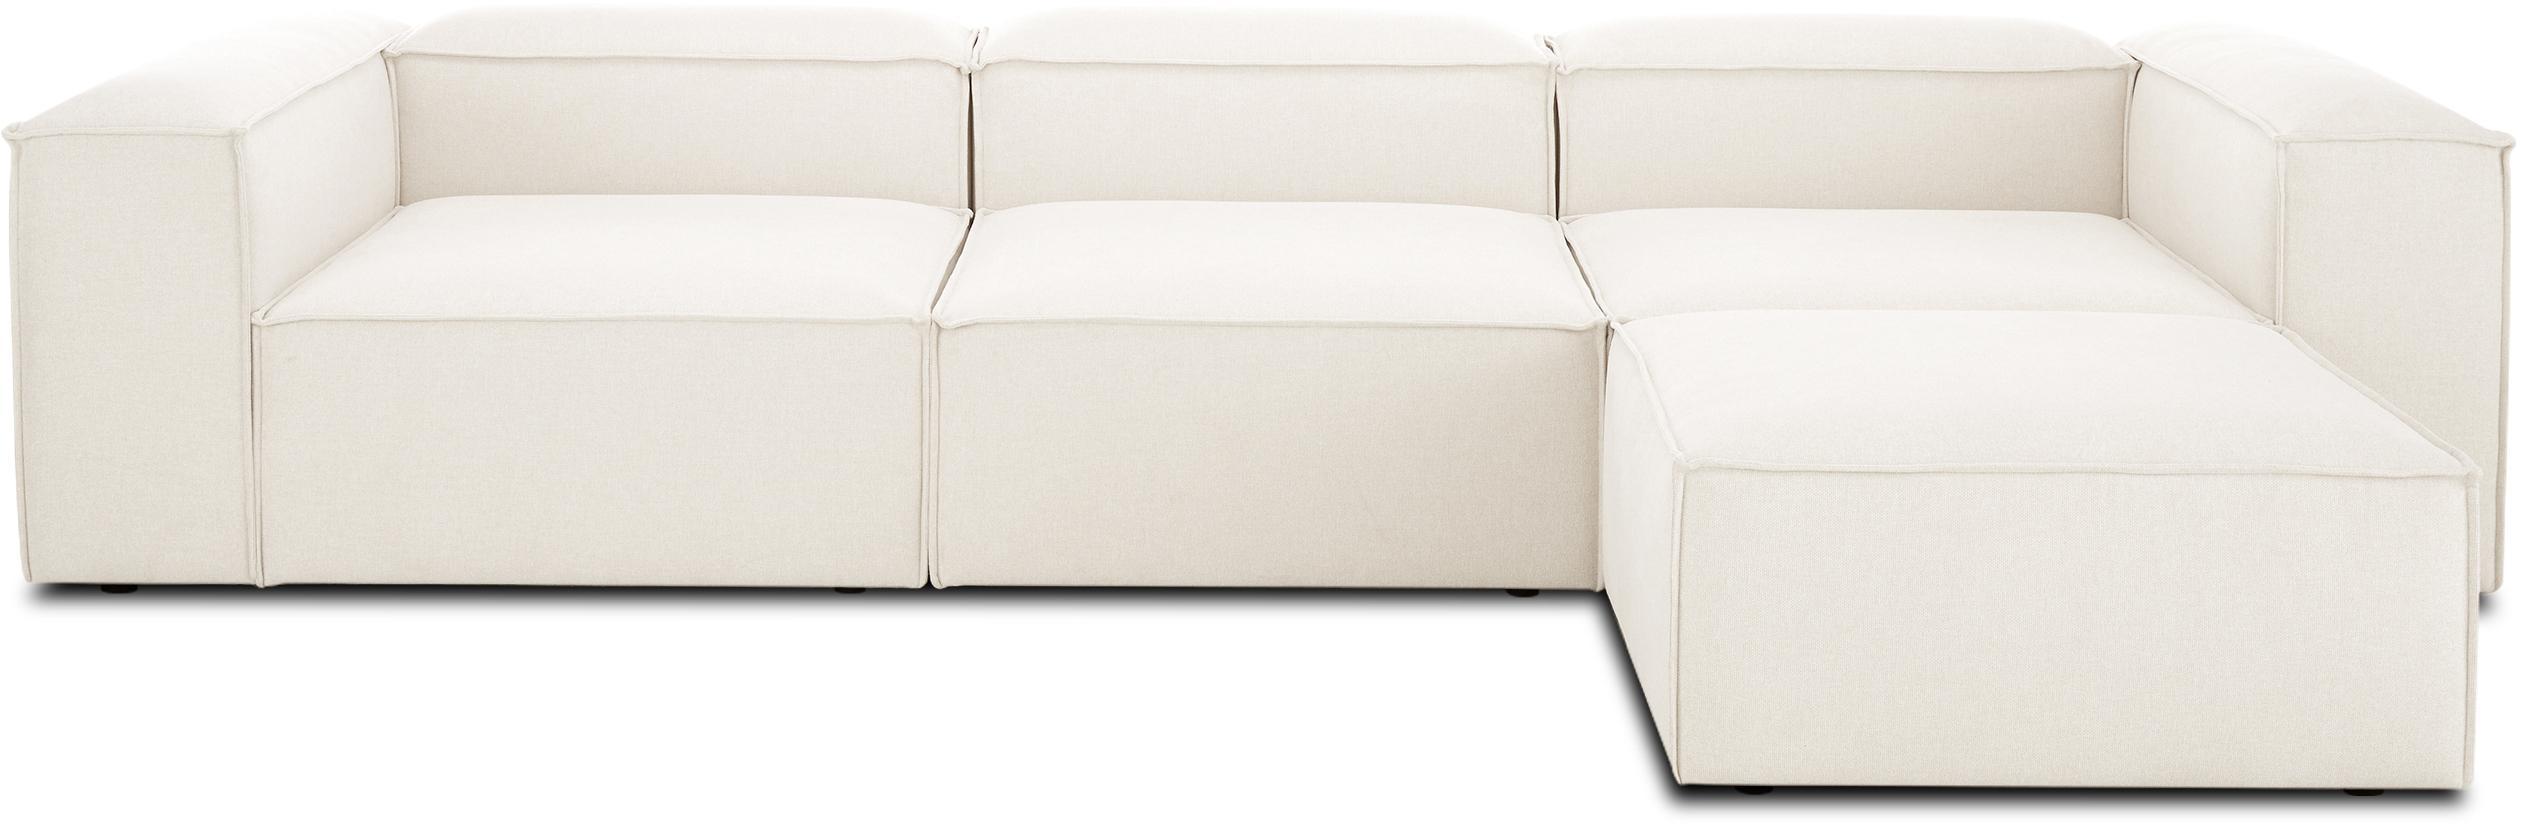 Sofá modular Lennon, Funda: 60%poliéster, 40%viscos, Estructura: madera de pino macizo, ag, Patas: plástico, Beige, An 333 x F 214 cm